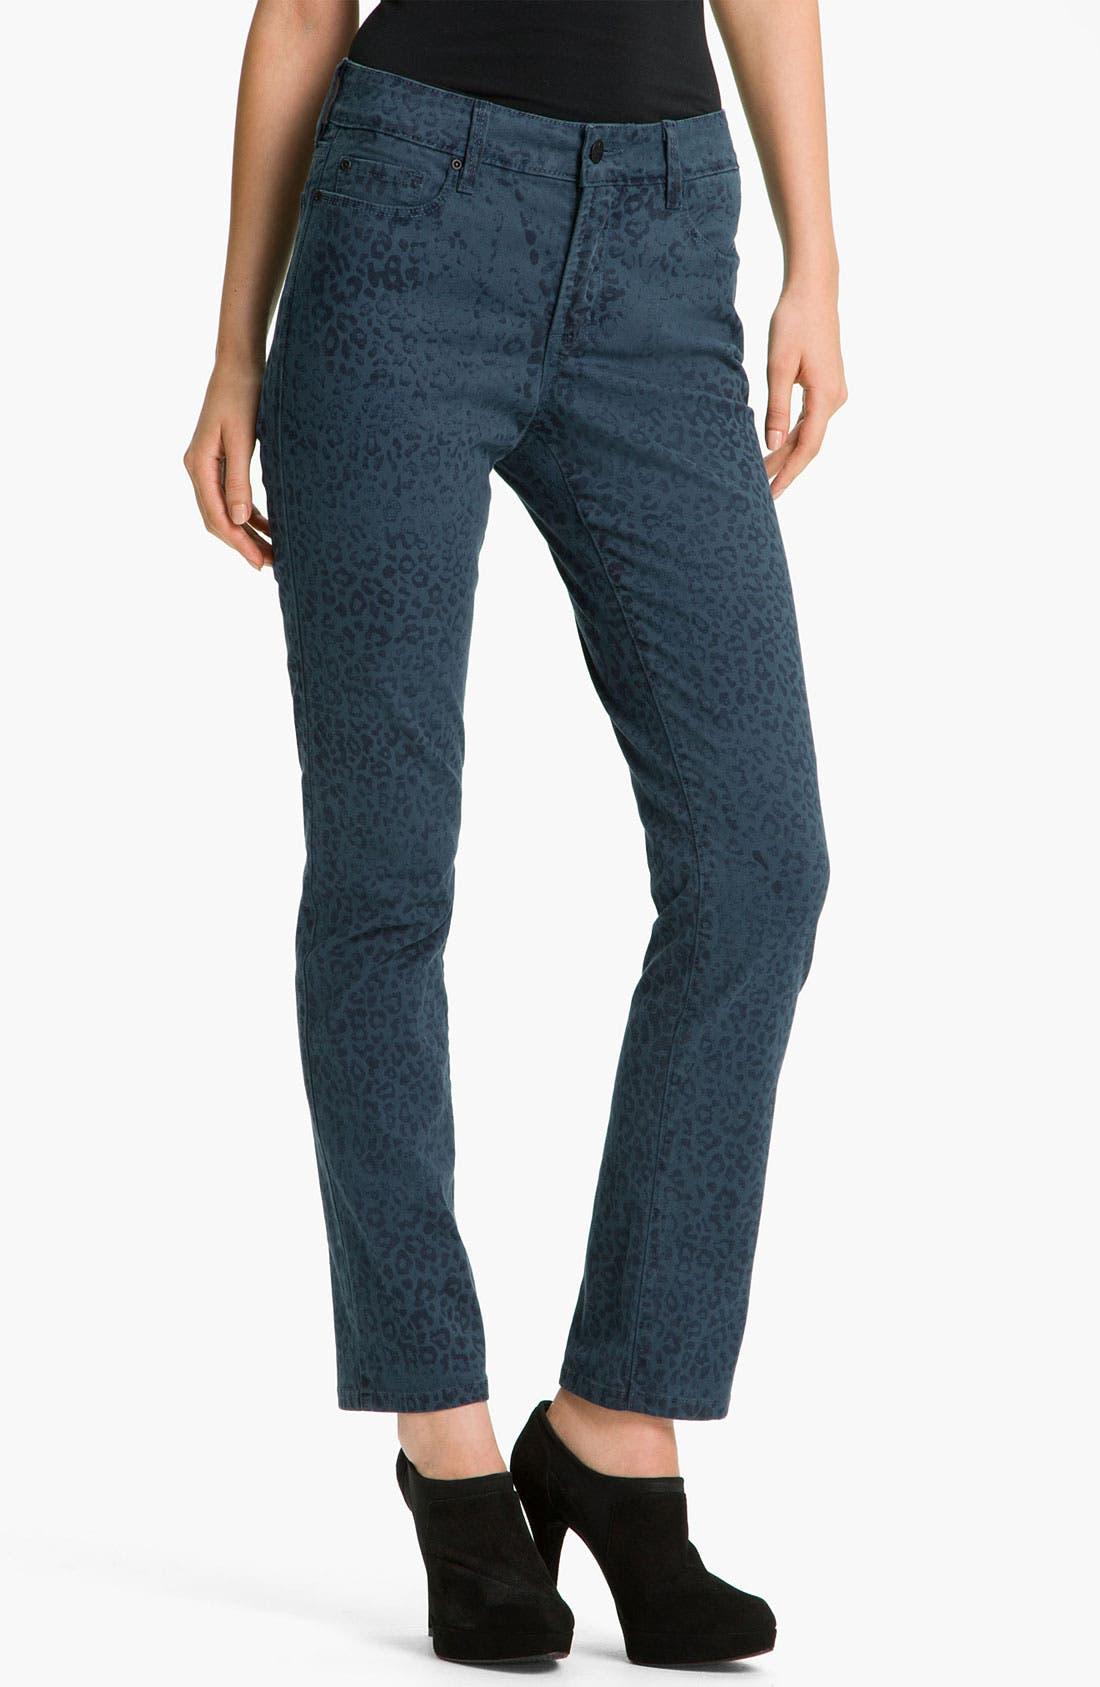 Main Image - NYDJ 'Sheri - Cheetah' Print Skinny Twill Jeans